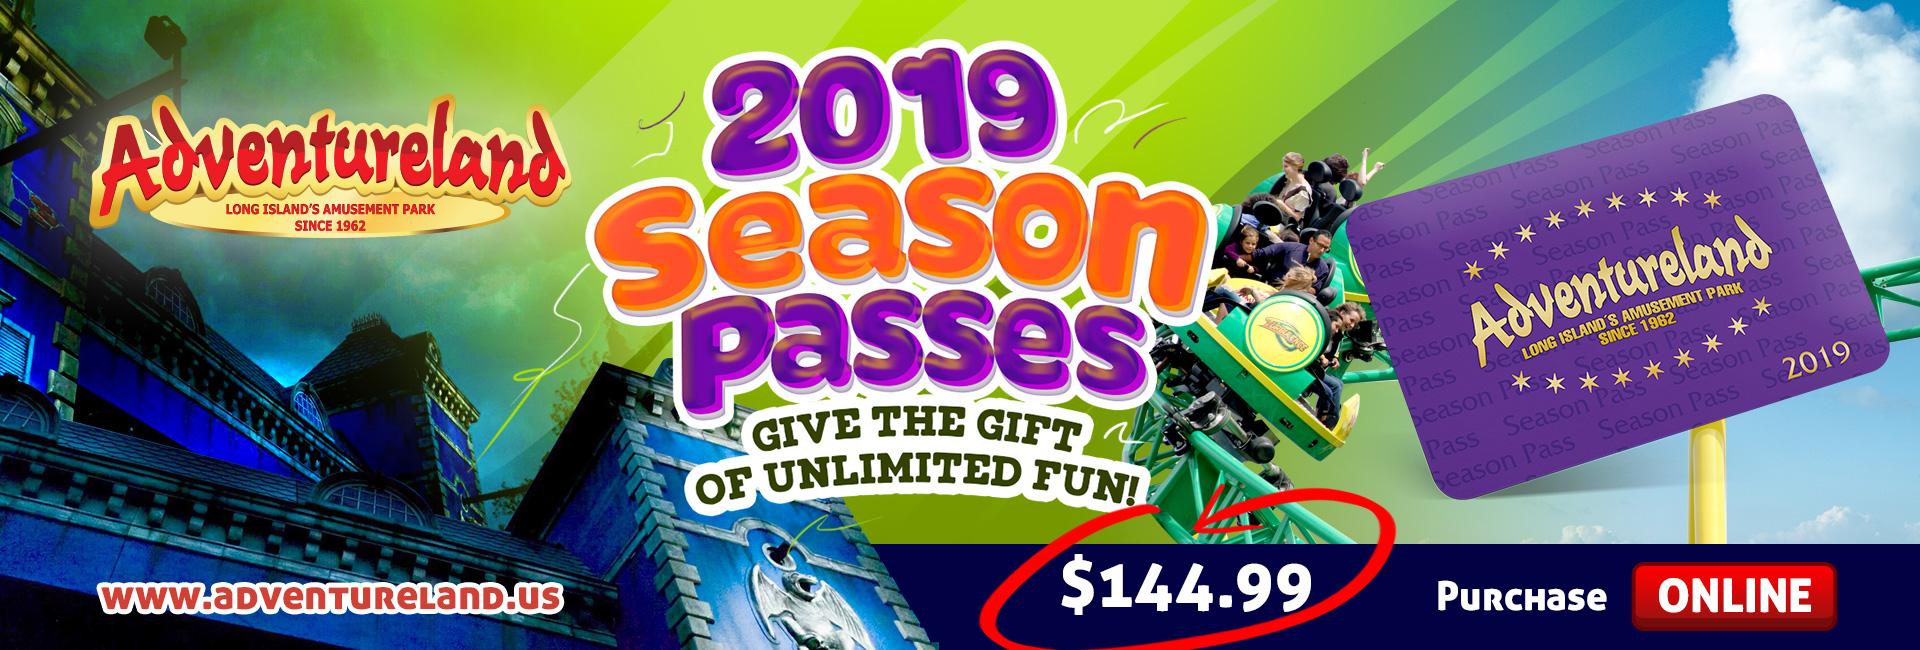 2019 Season Passes Available!